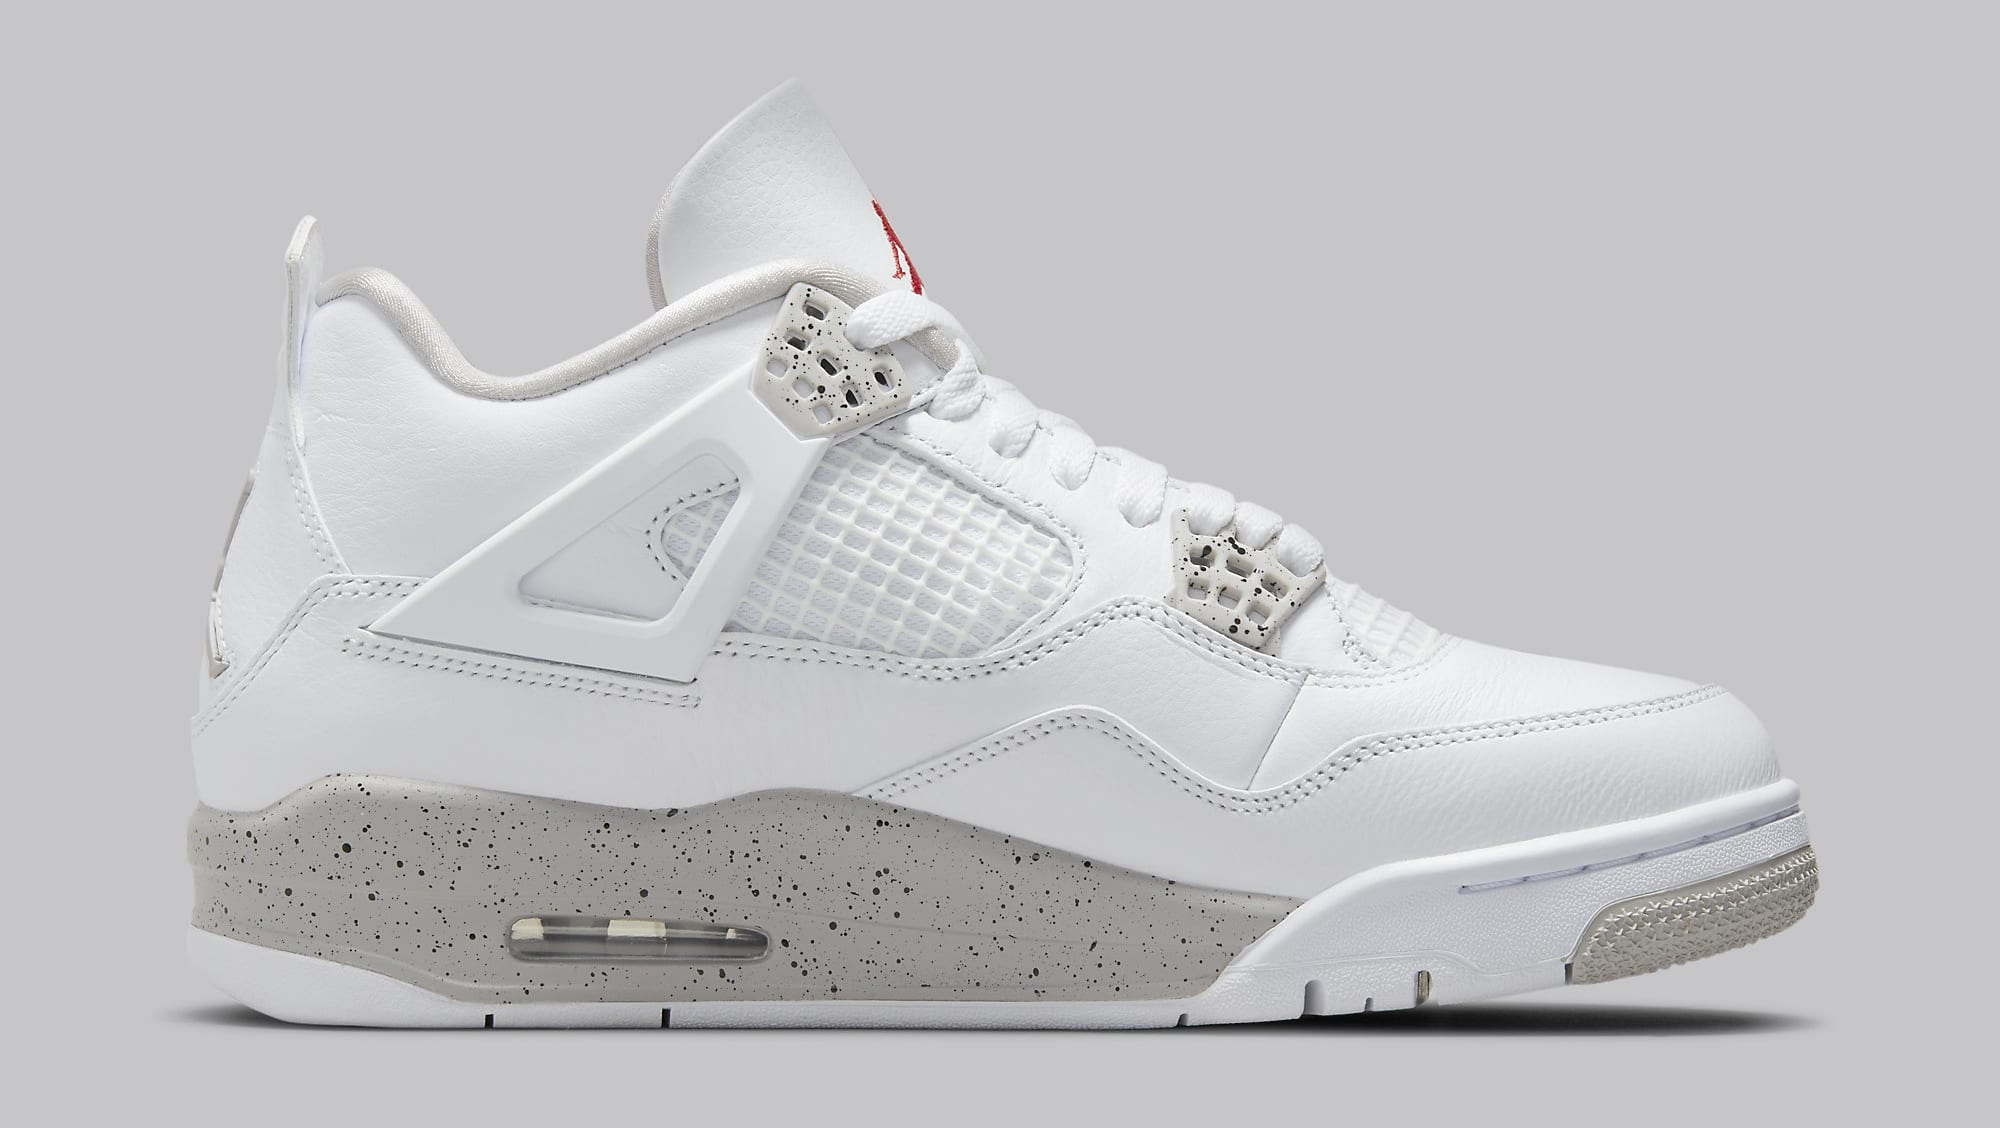 Air Jordan 4 Retro 'White Oreo' CT8527-100 Medial